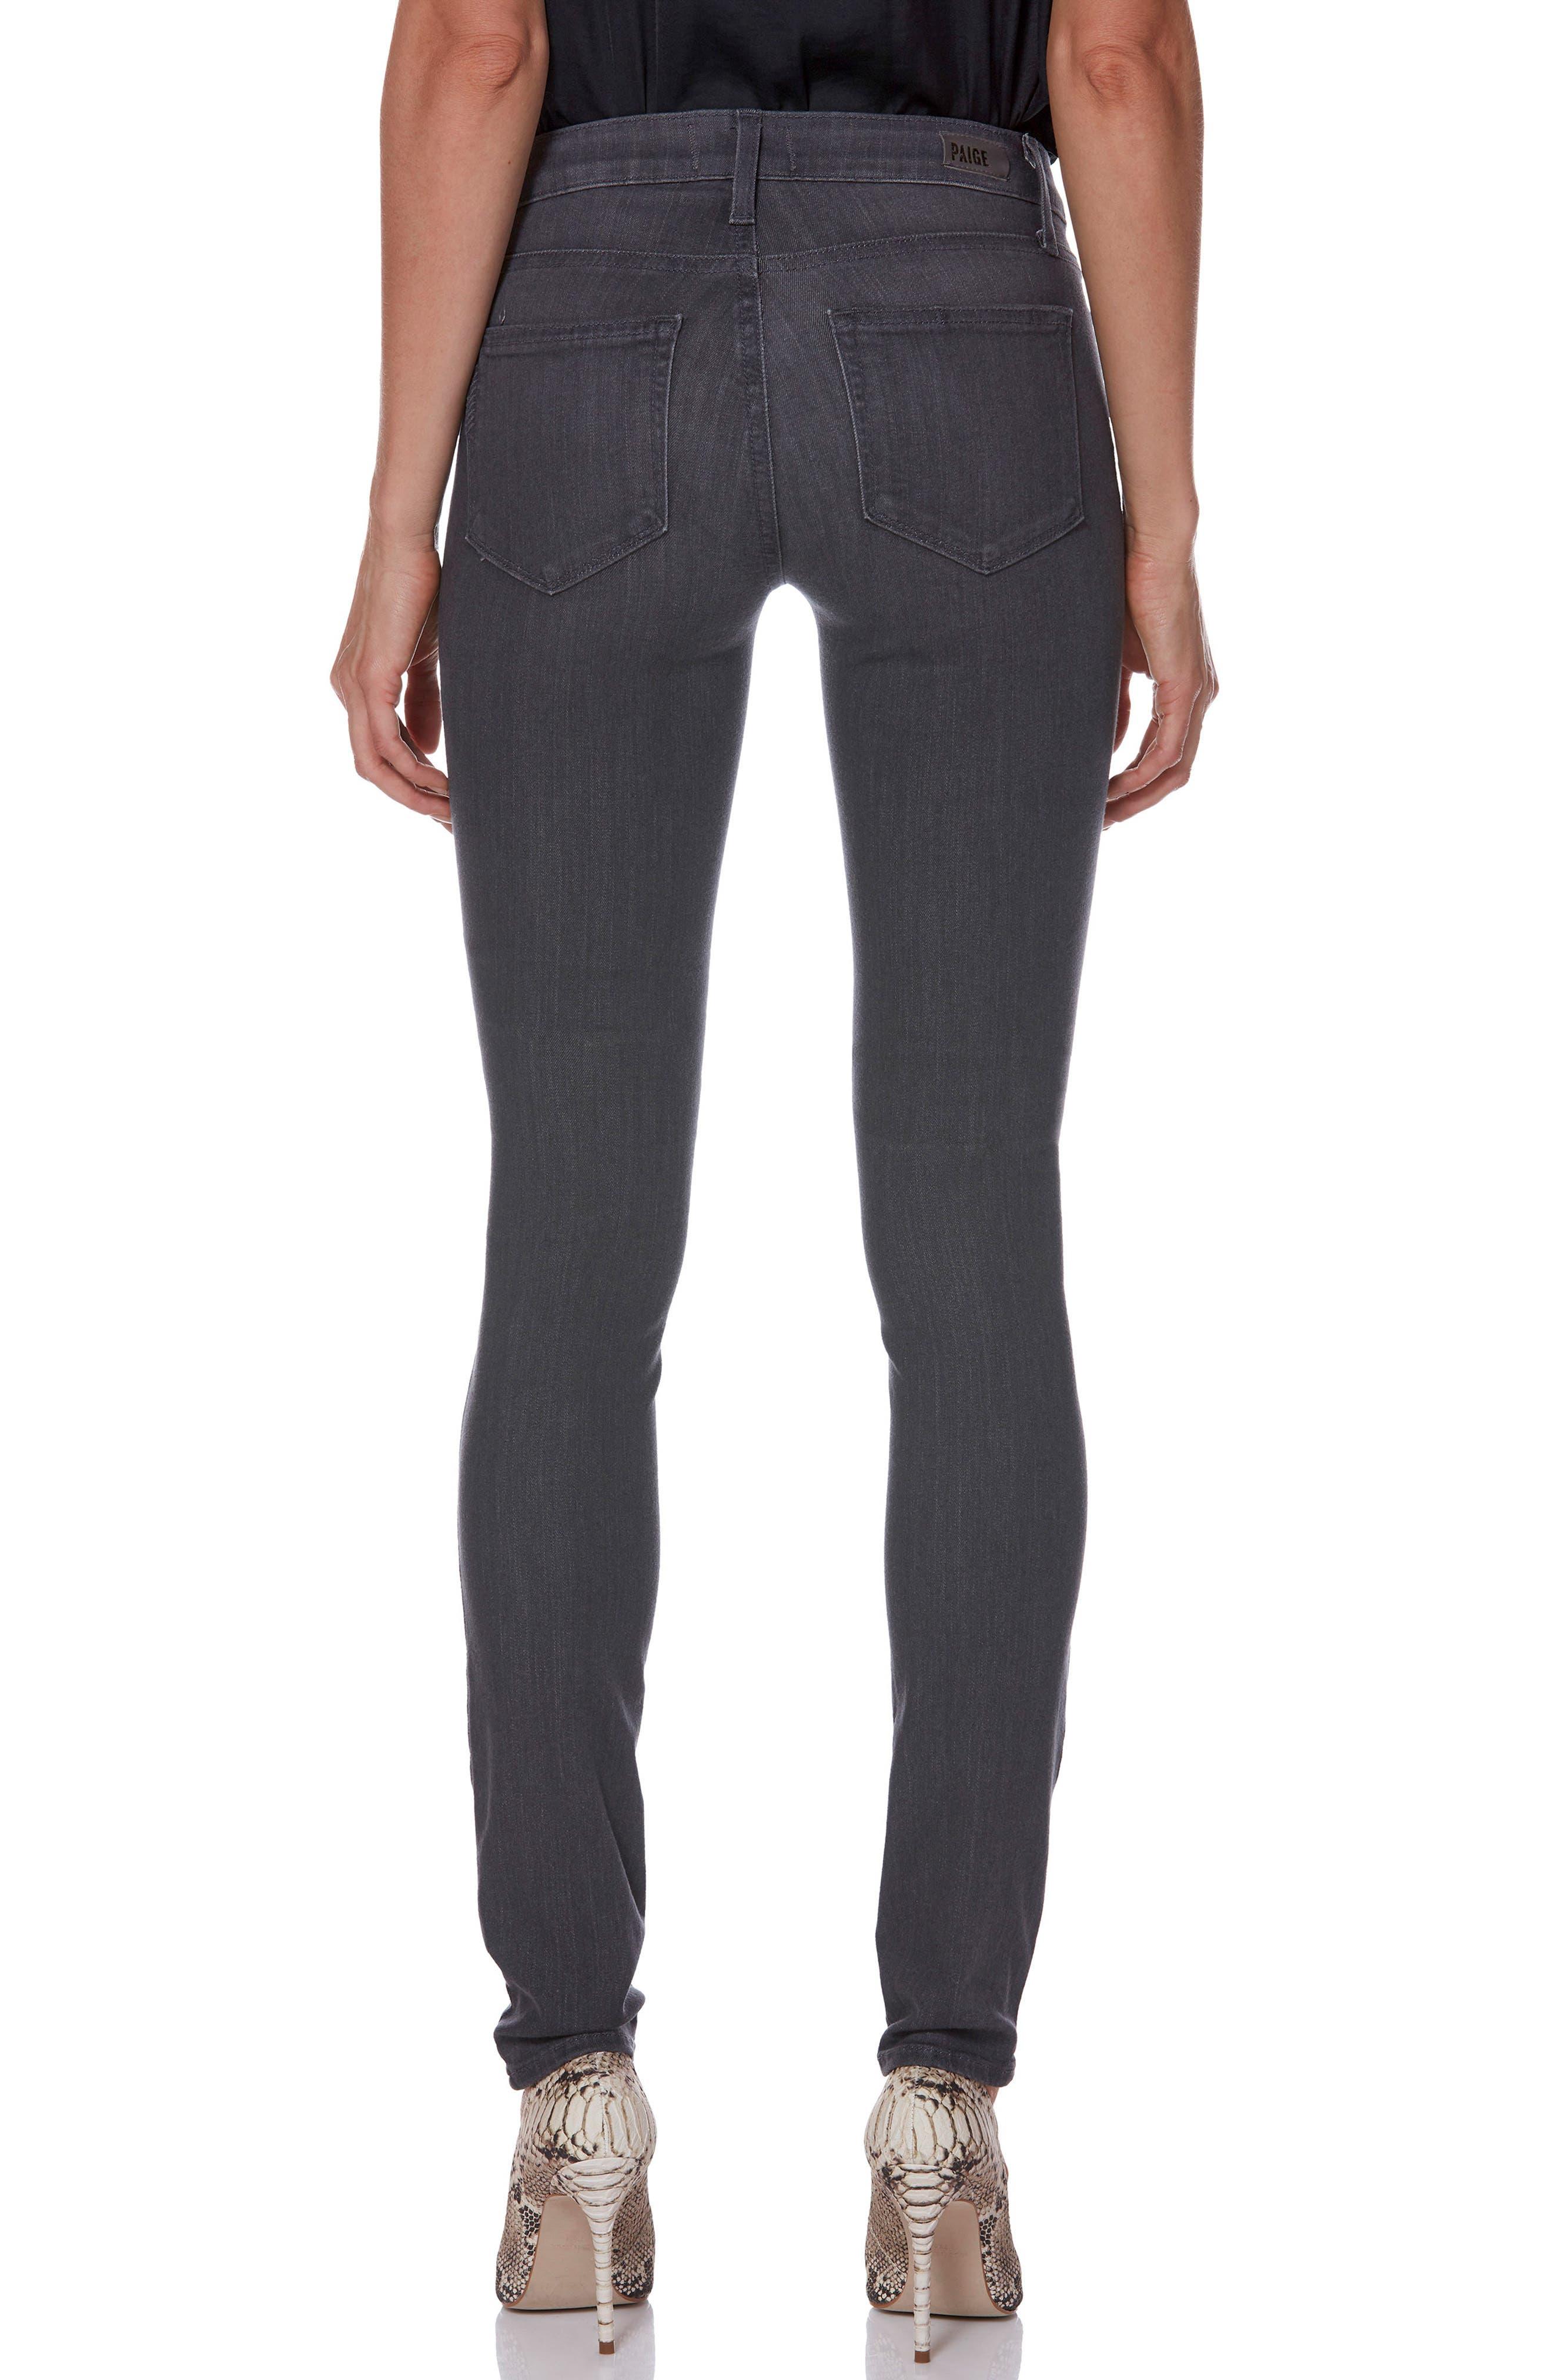 Transcend - Leggy Ultra Skinny Jeans,                             Alternate thumbnail 2, color,                             GREY PEAKS